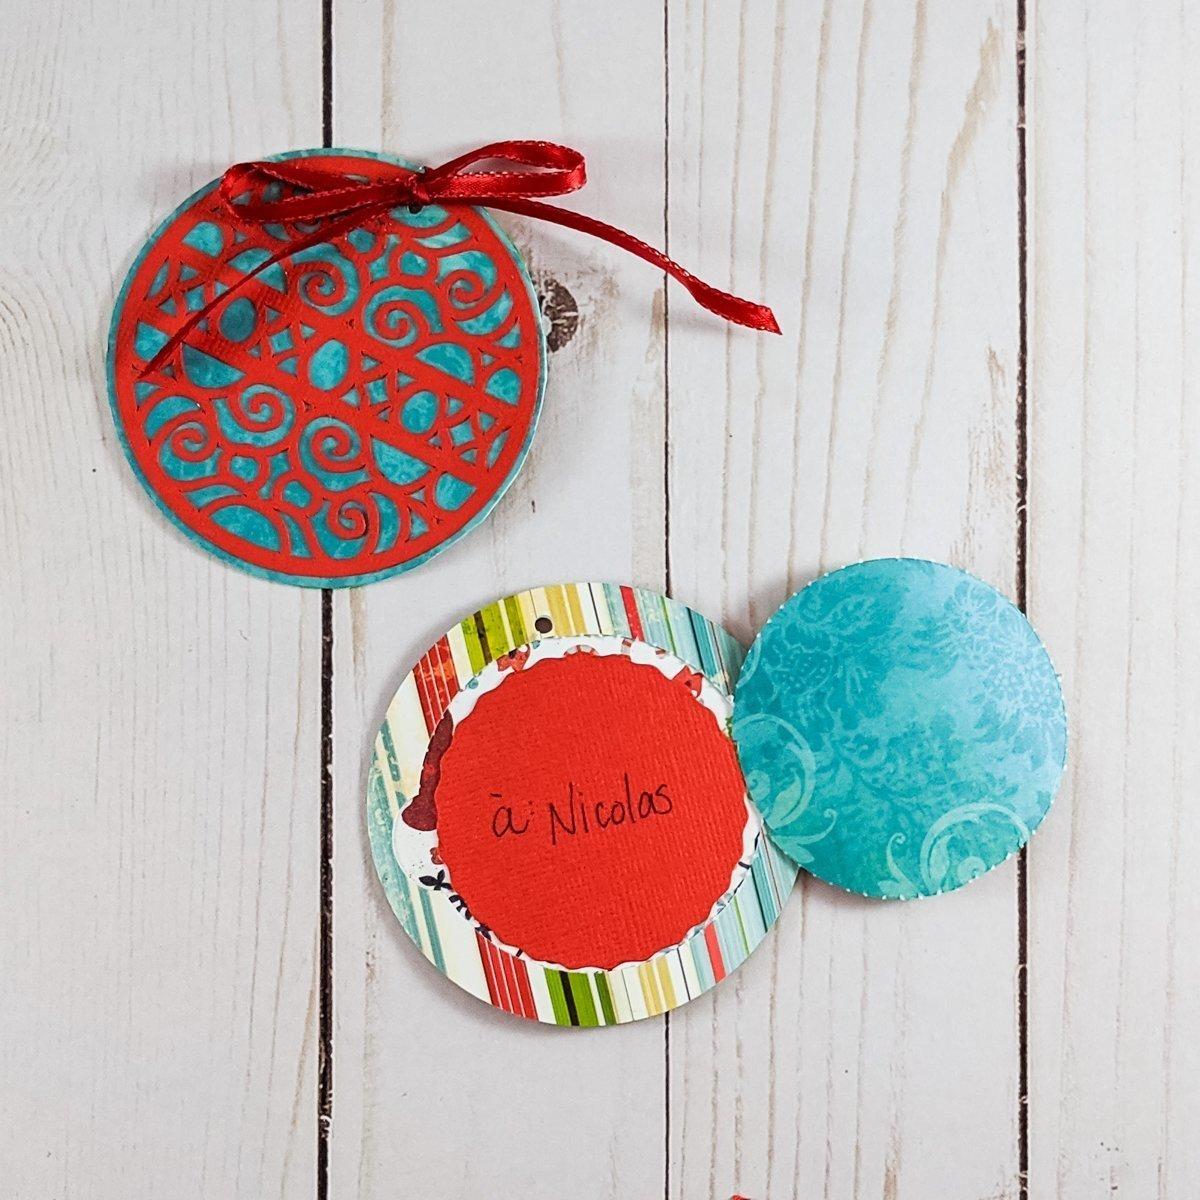 DIY gift tag for a Secret Santa Christmas gift exchange